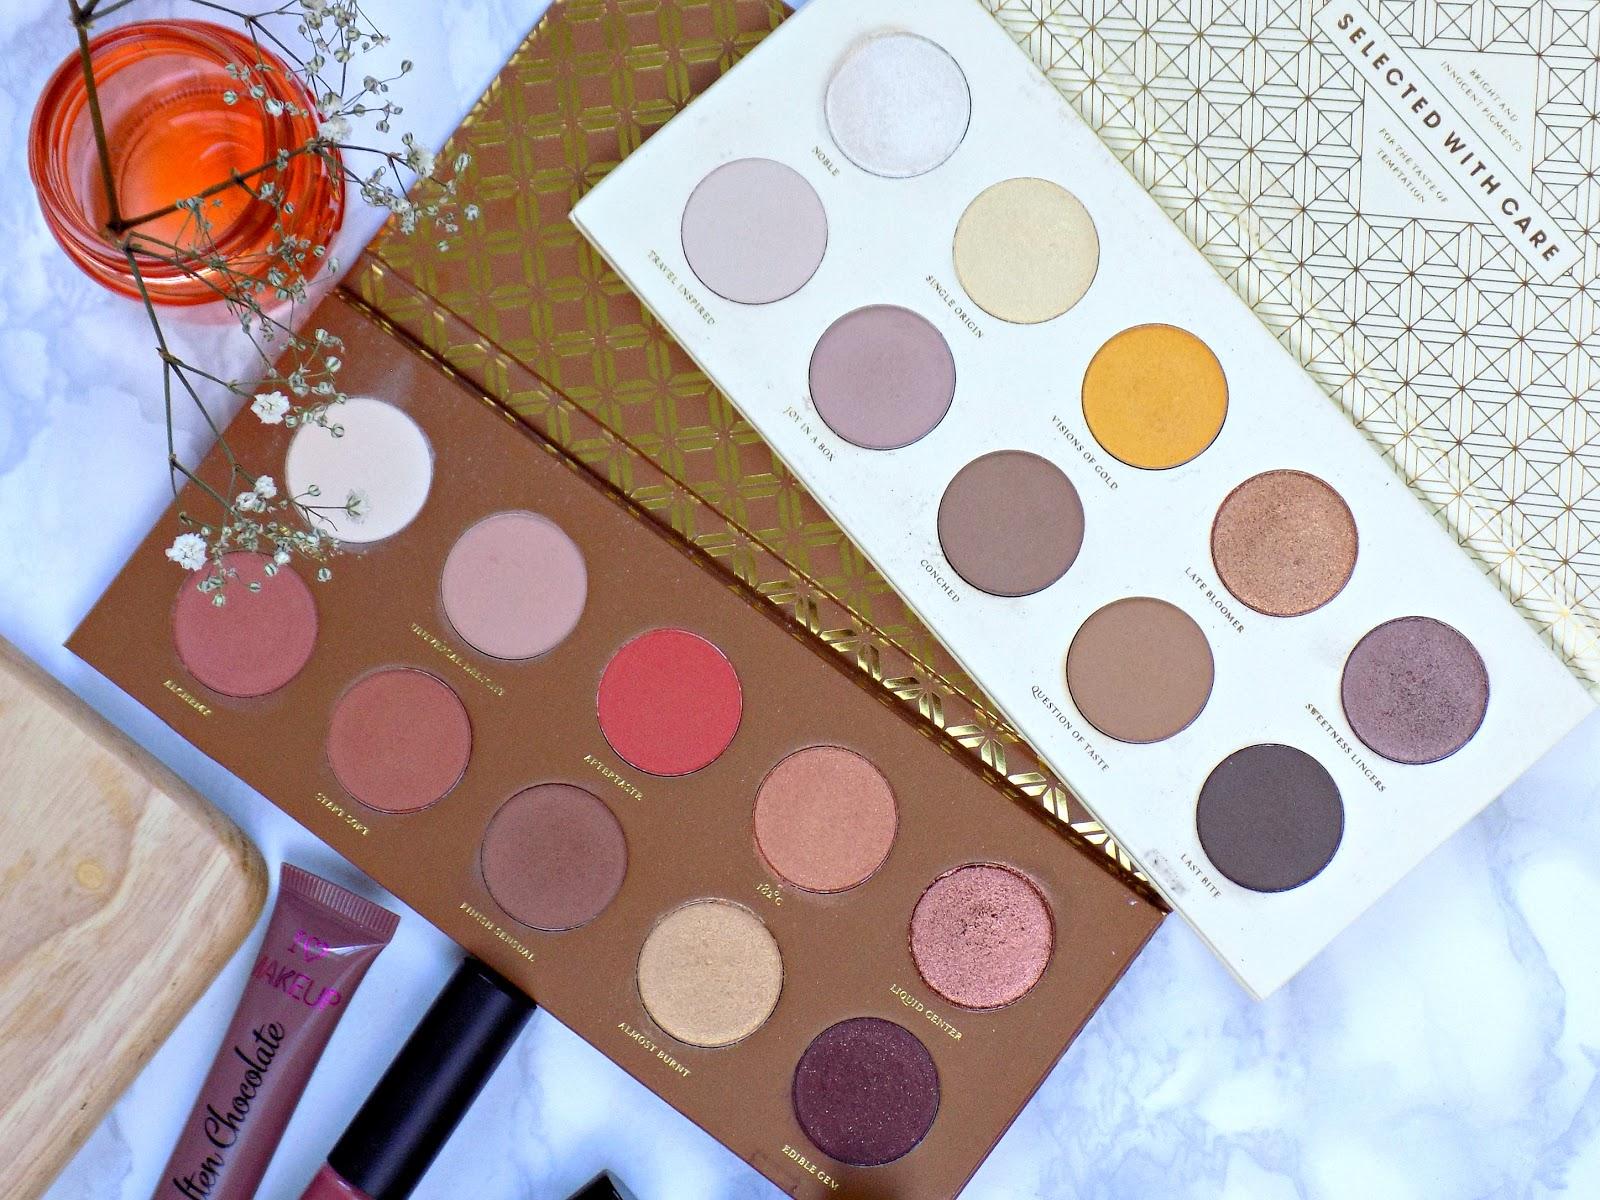 Zoeva Caramel Melange and Blanc Fusion palettes